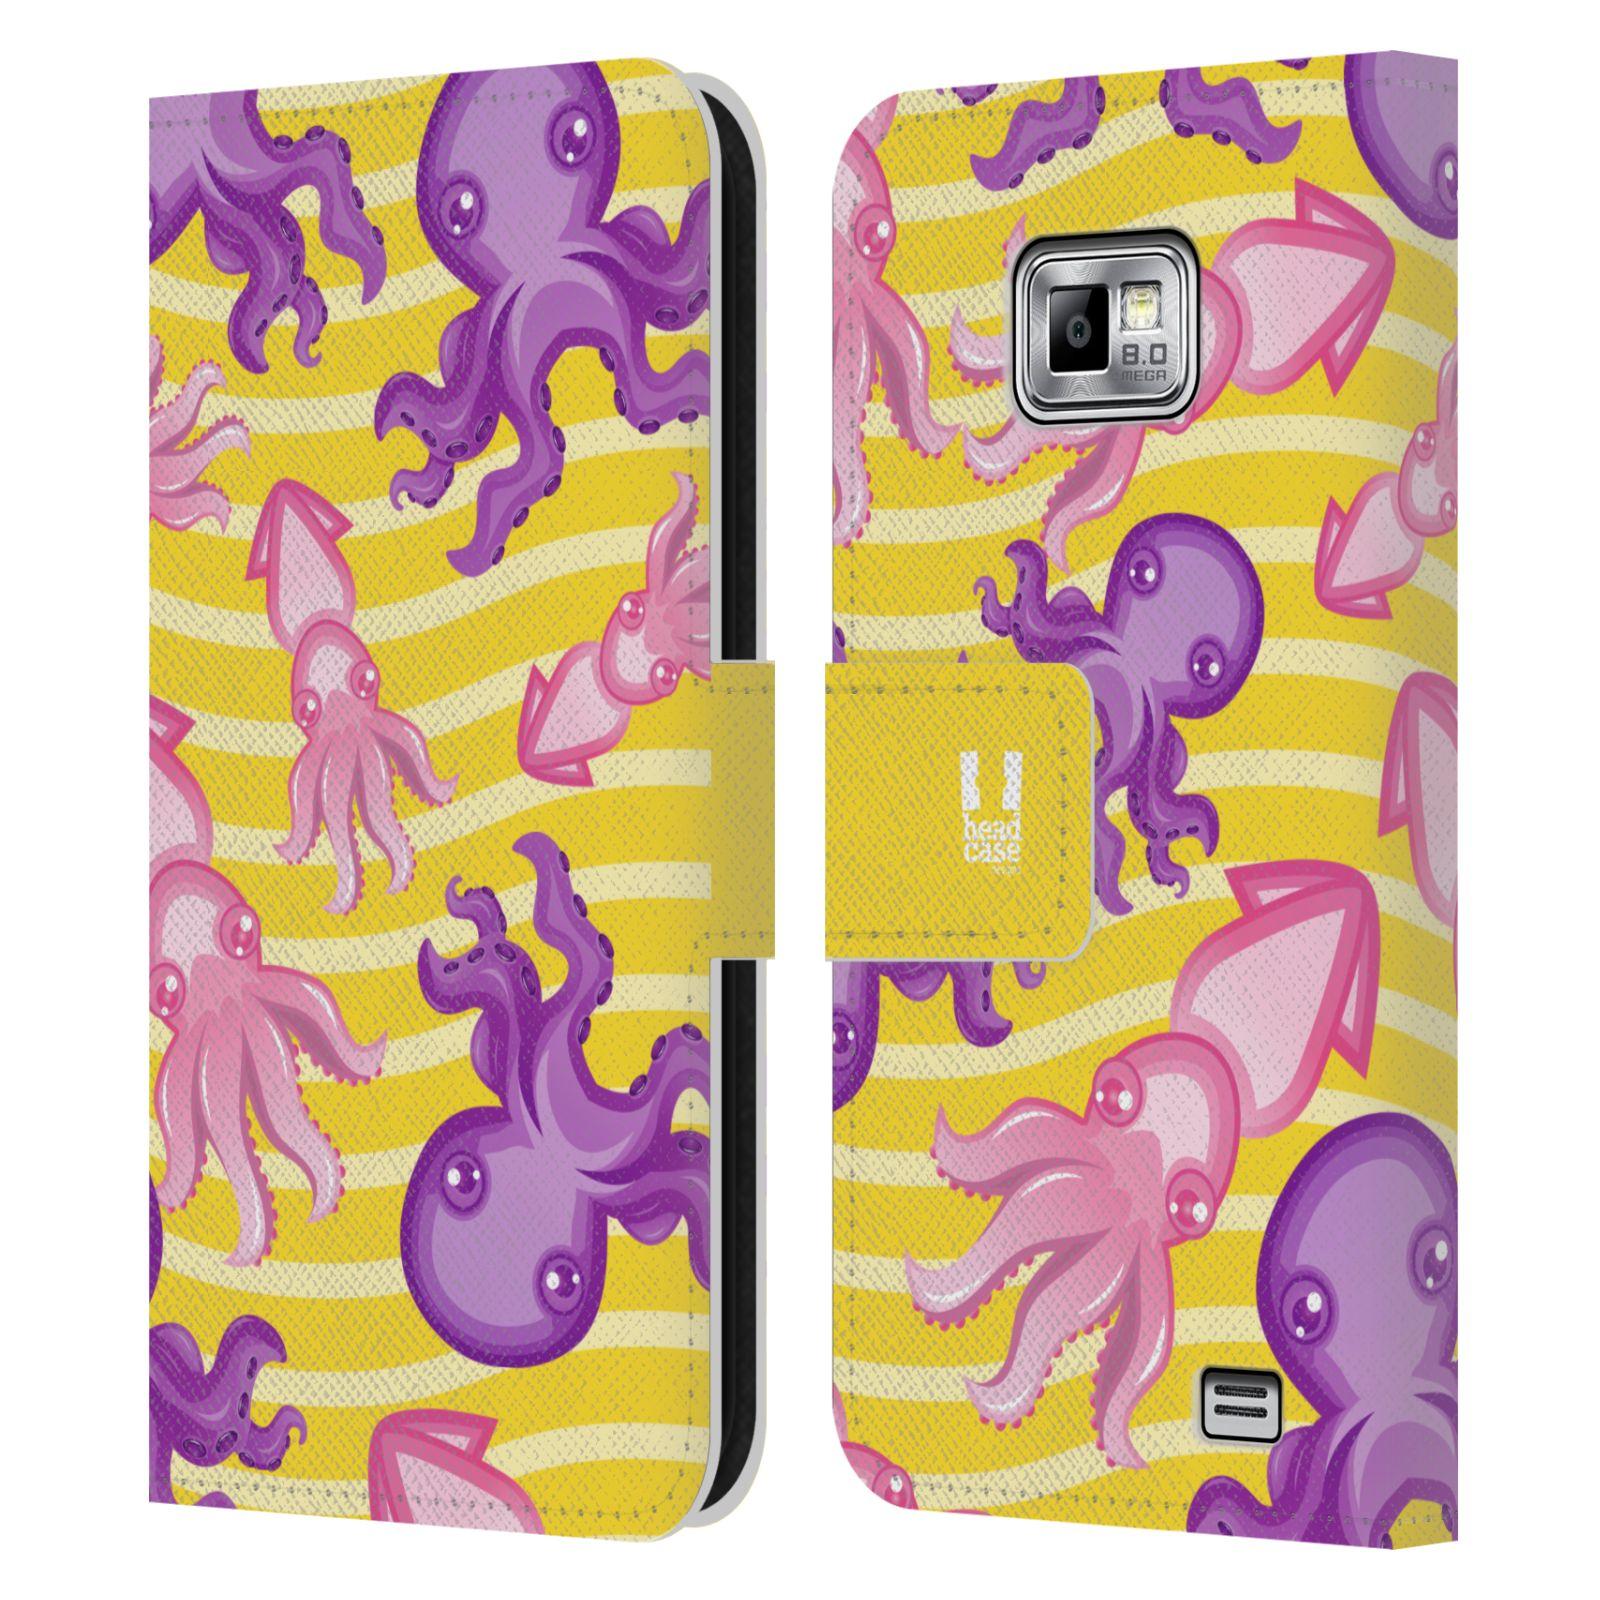 HEAD CASE Flipové pouzdro pro mobil Samsung Galaxy S2 i9100 Mořský živočich chobotnice a krakatice žlutá barva